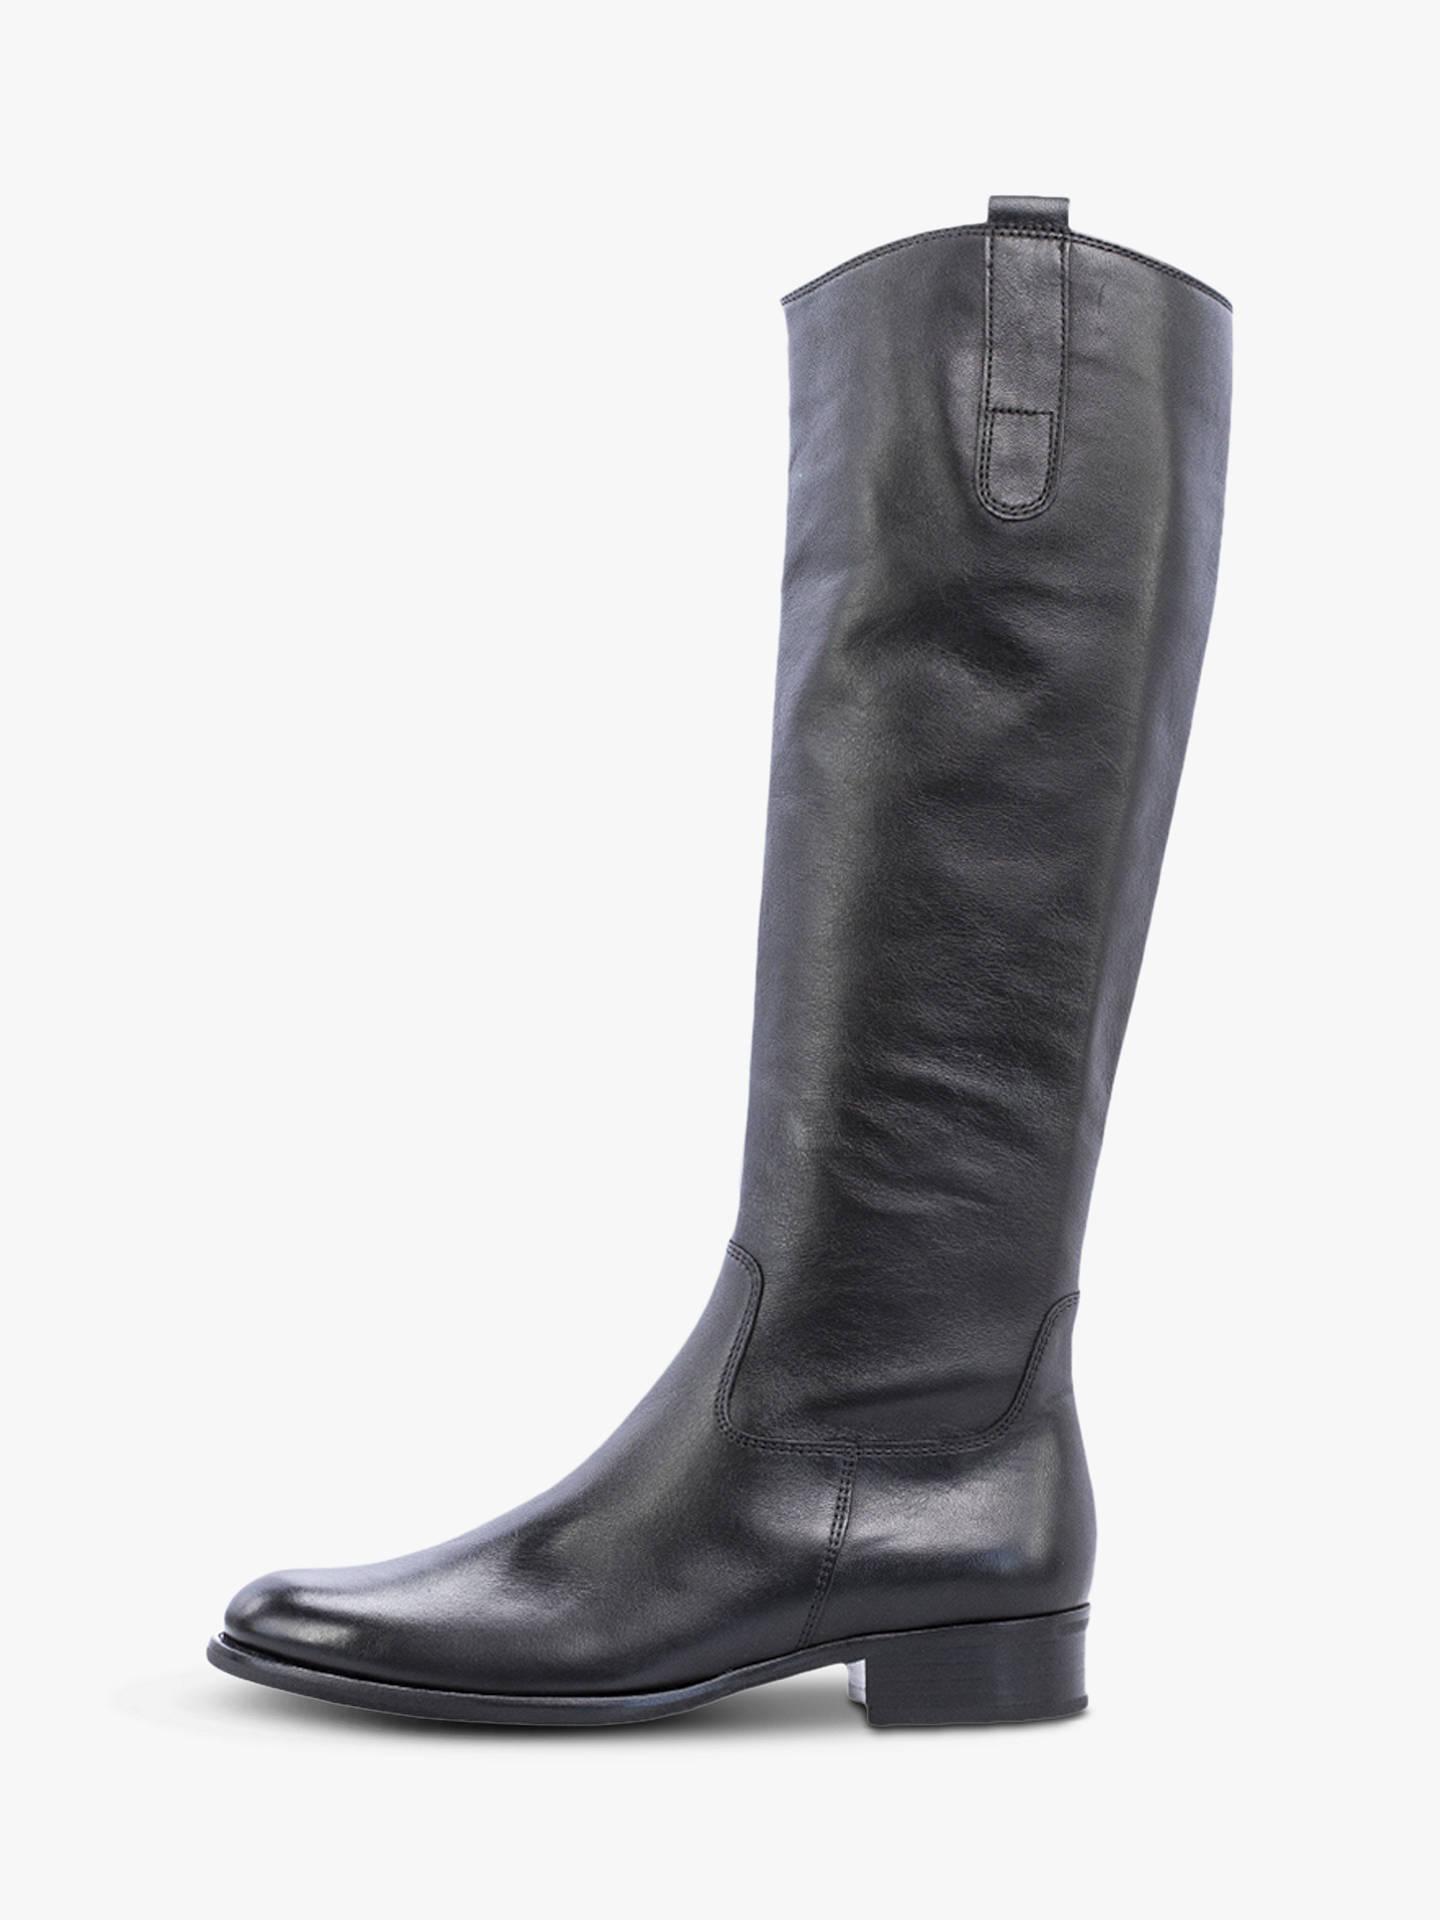 1dba2cf1c9a Gabor Brook Slim Fit Low Block Heel Knee Boots at John Lewis   Partners